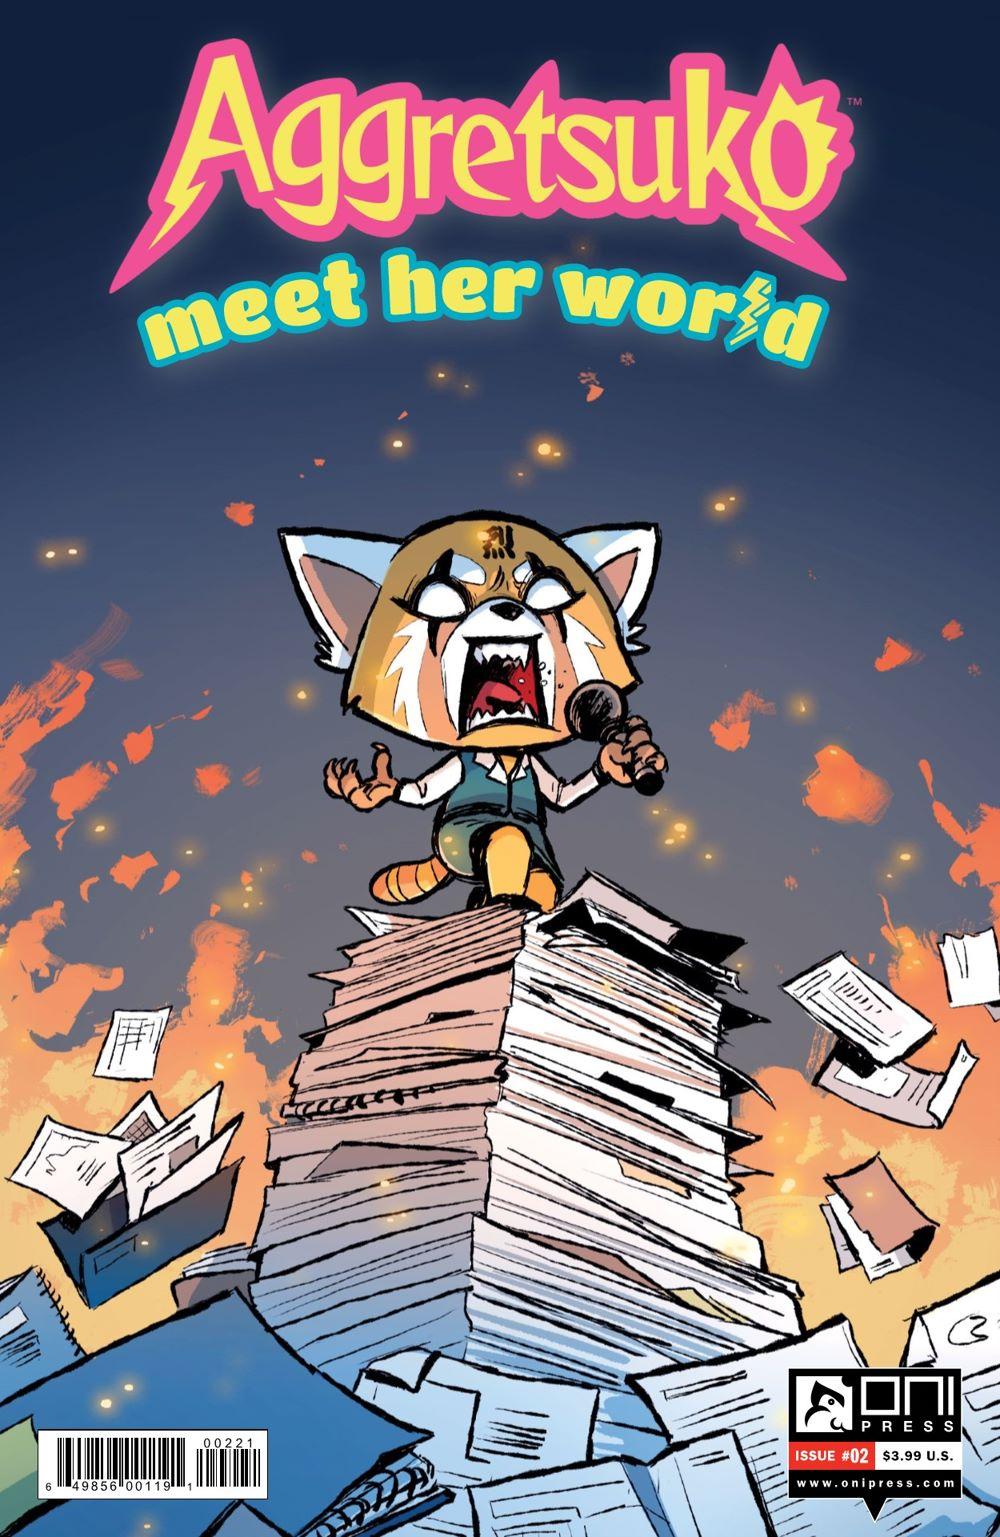 AGGRETSUKO-MHW-2-MARKETING-02-1 ComicList Previews: AGGRETSUKO MEET HER WORLD #2